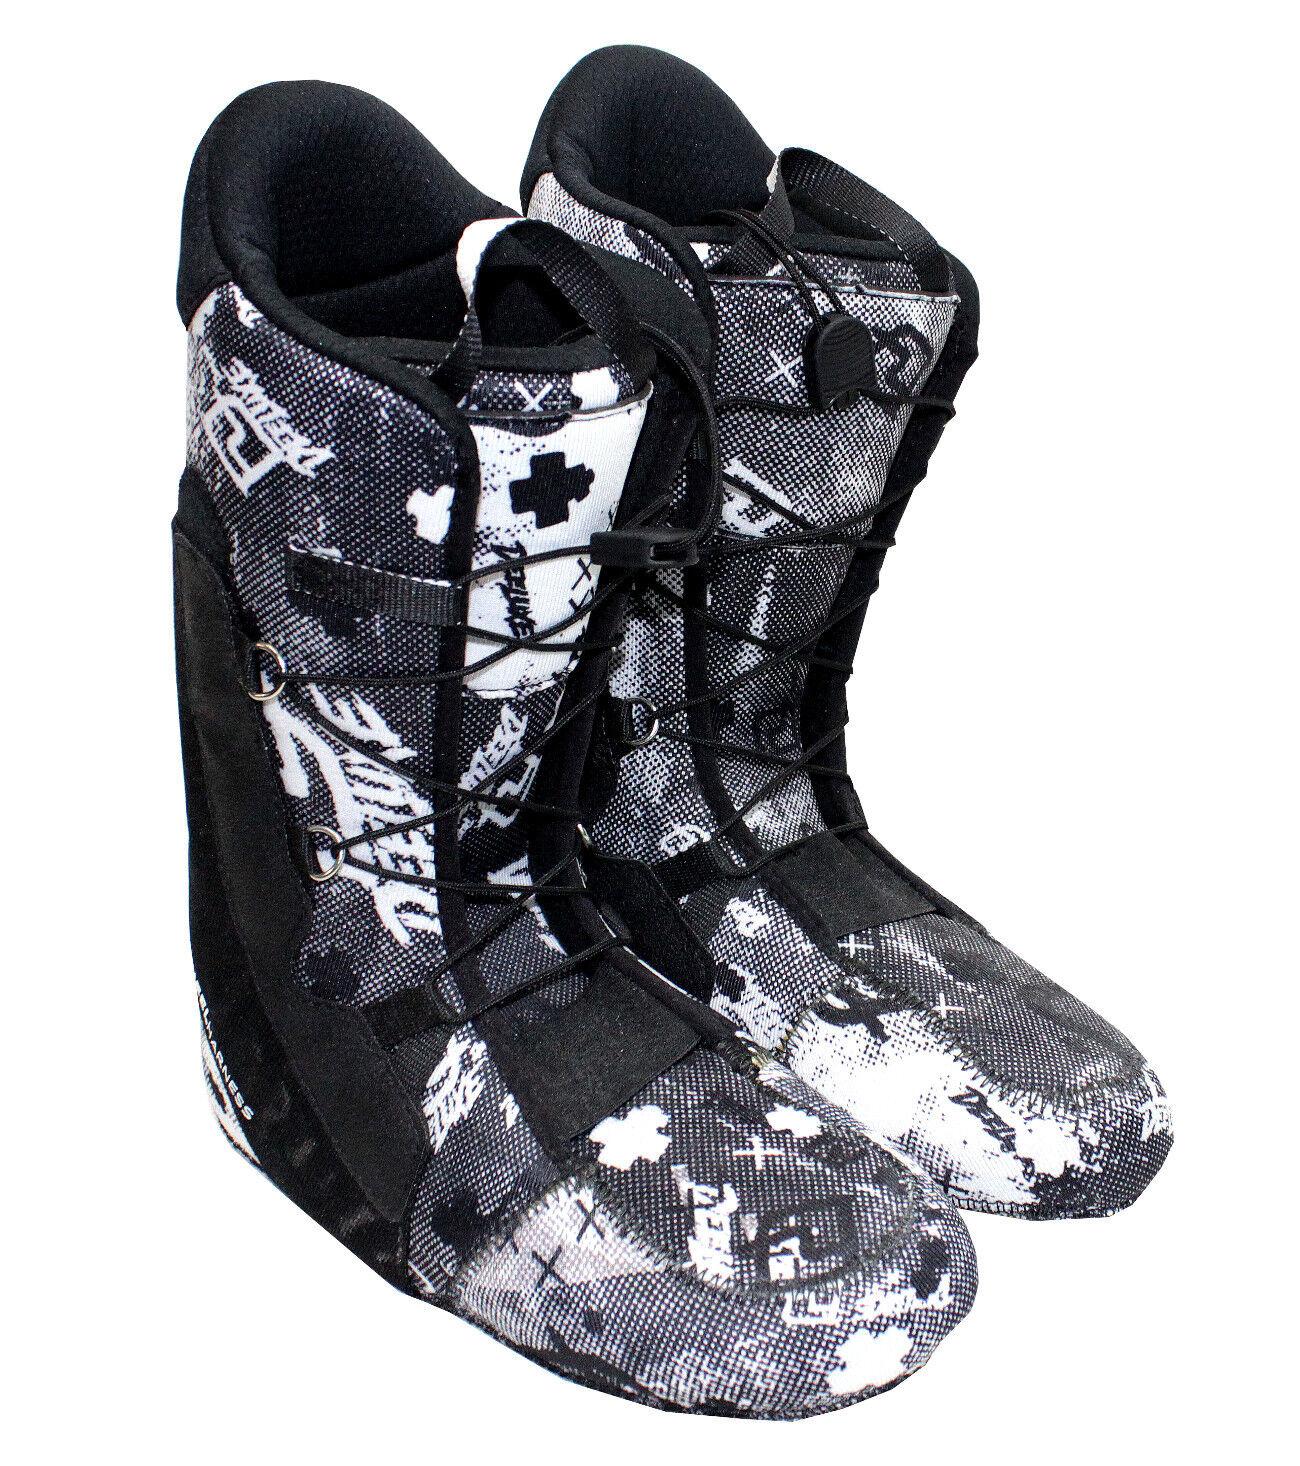 Deeluxe Raichle Innenschuh normal - thermo HardStiefel HardStiefel HardStiefel Snowboardschuh Stiefel UPS Blax 357fca